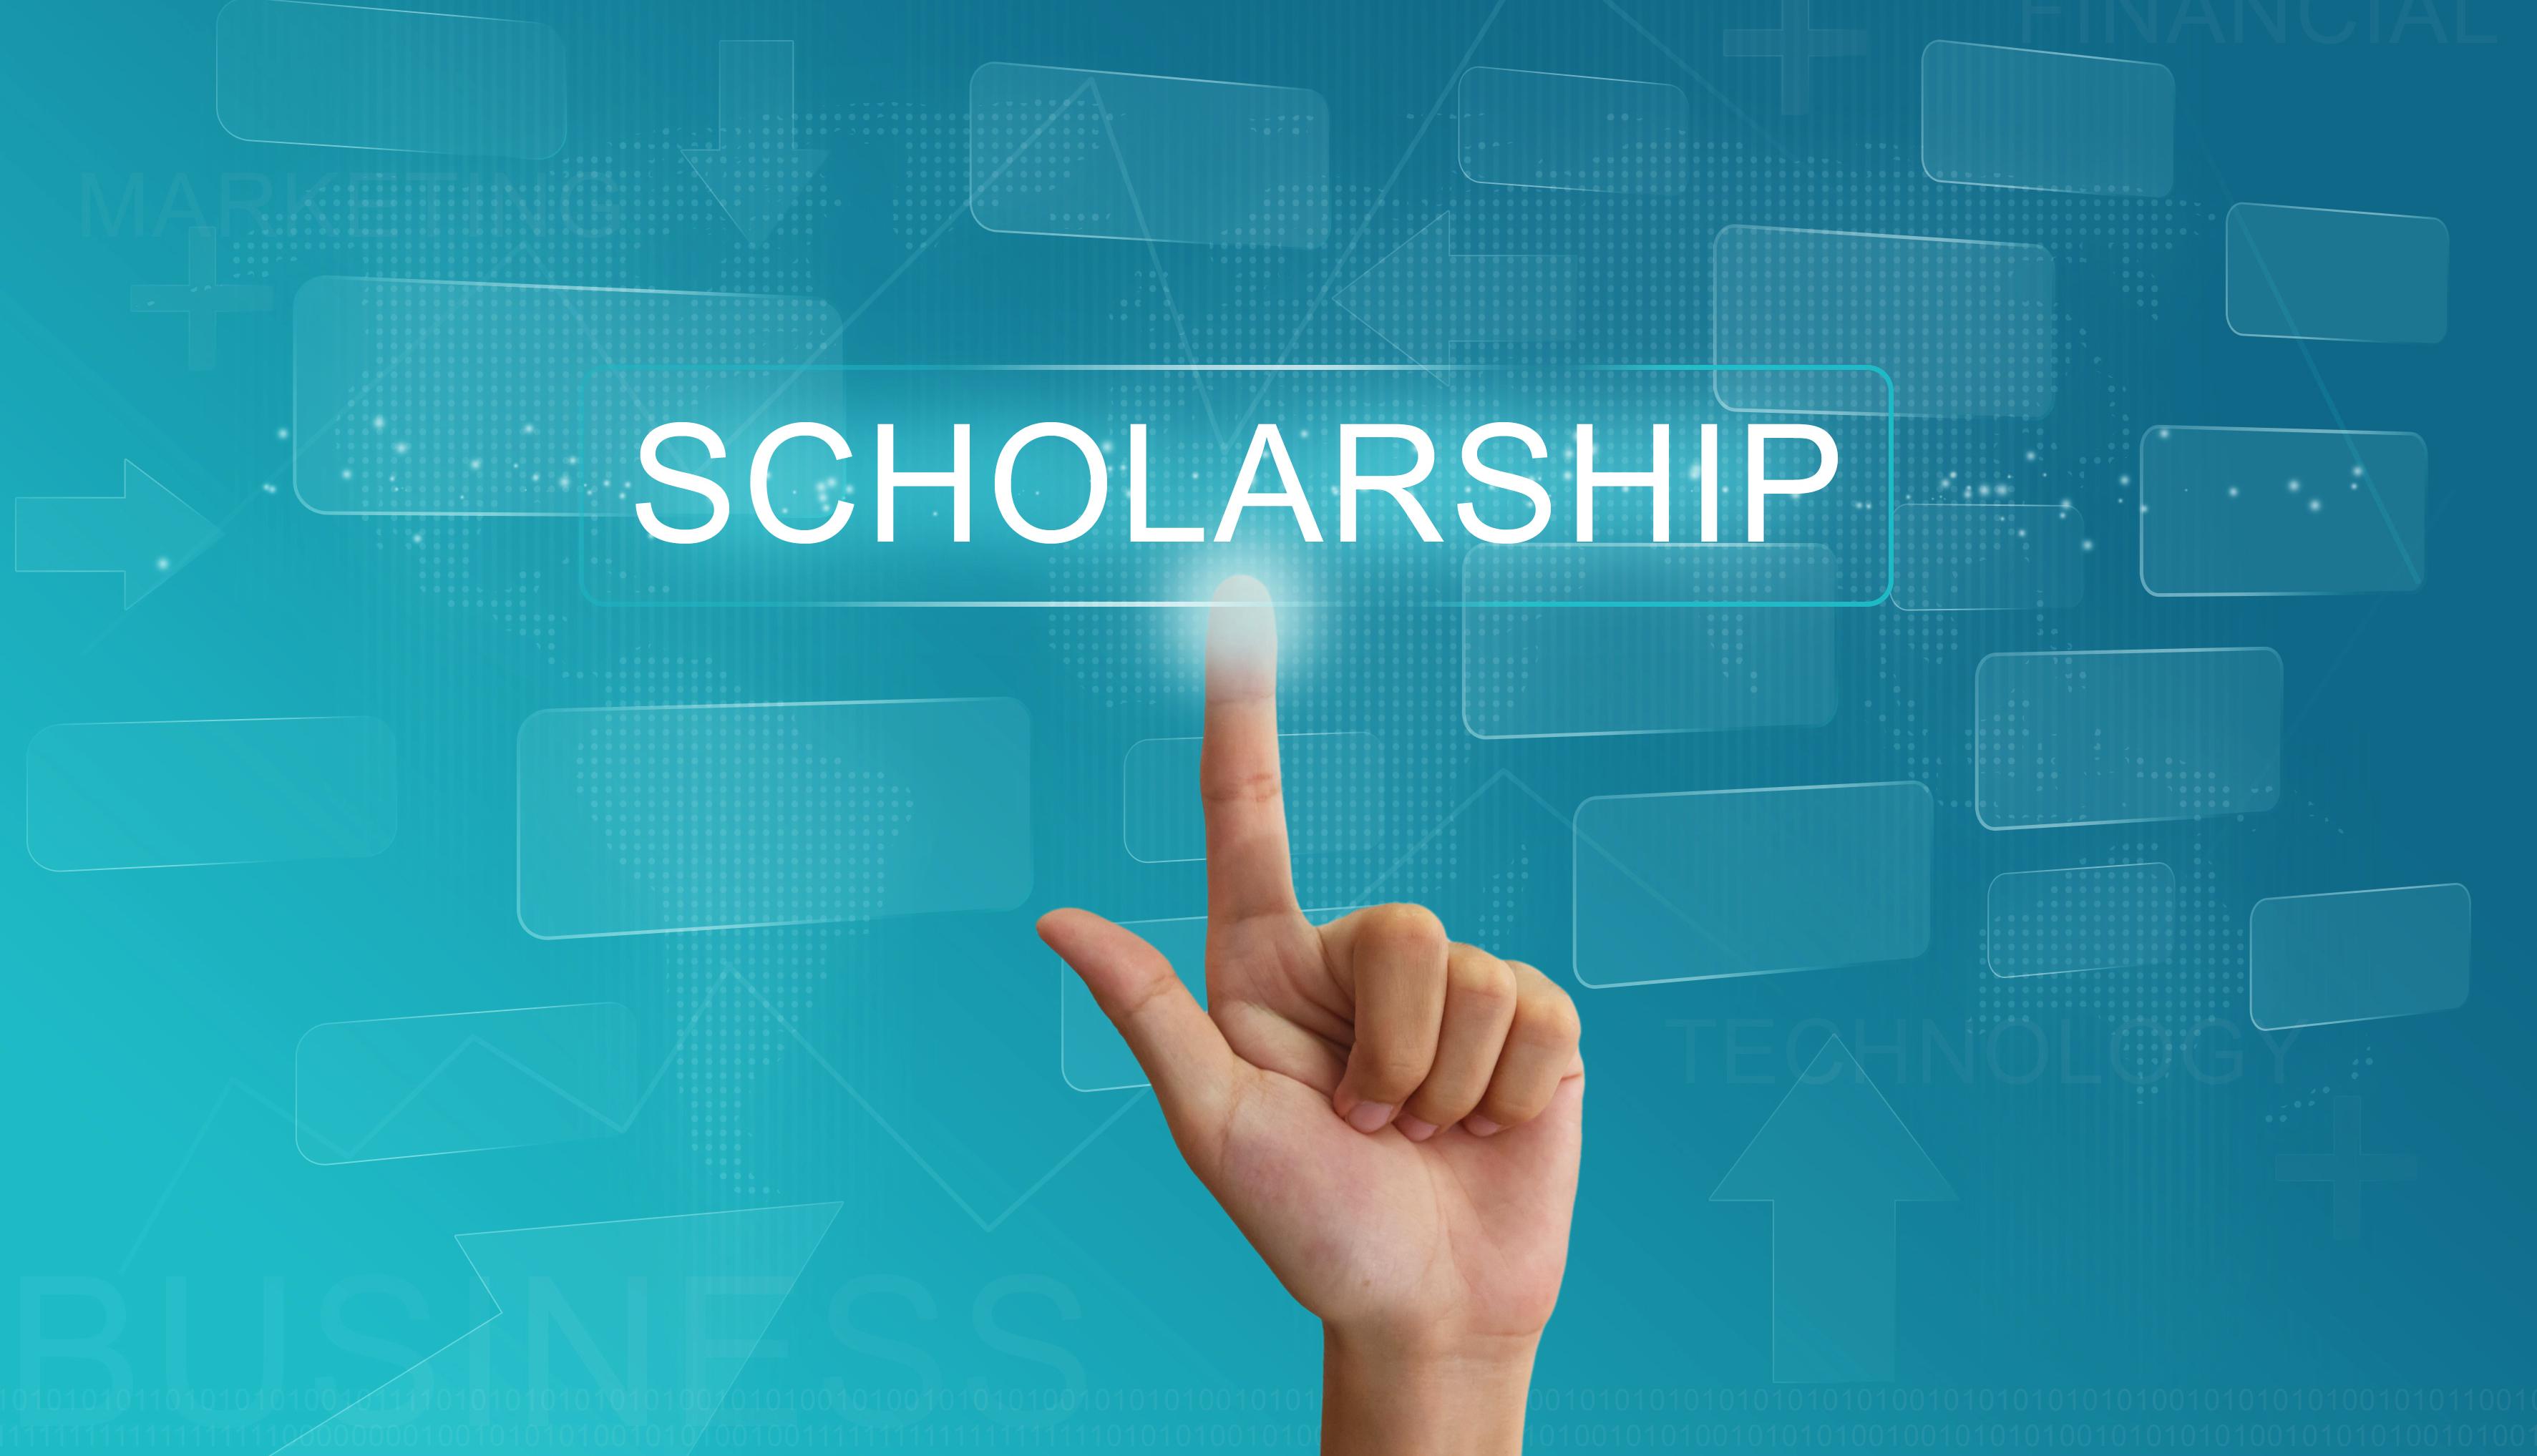 Scholarship Stock Photo